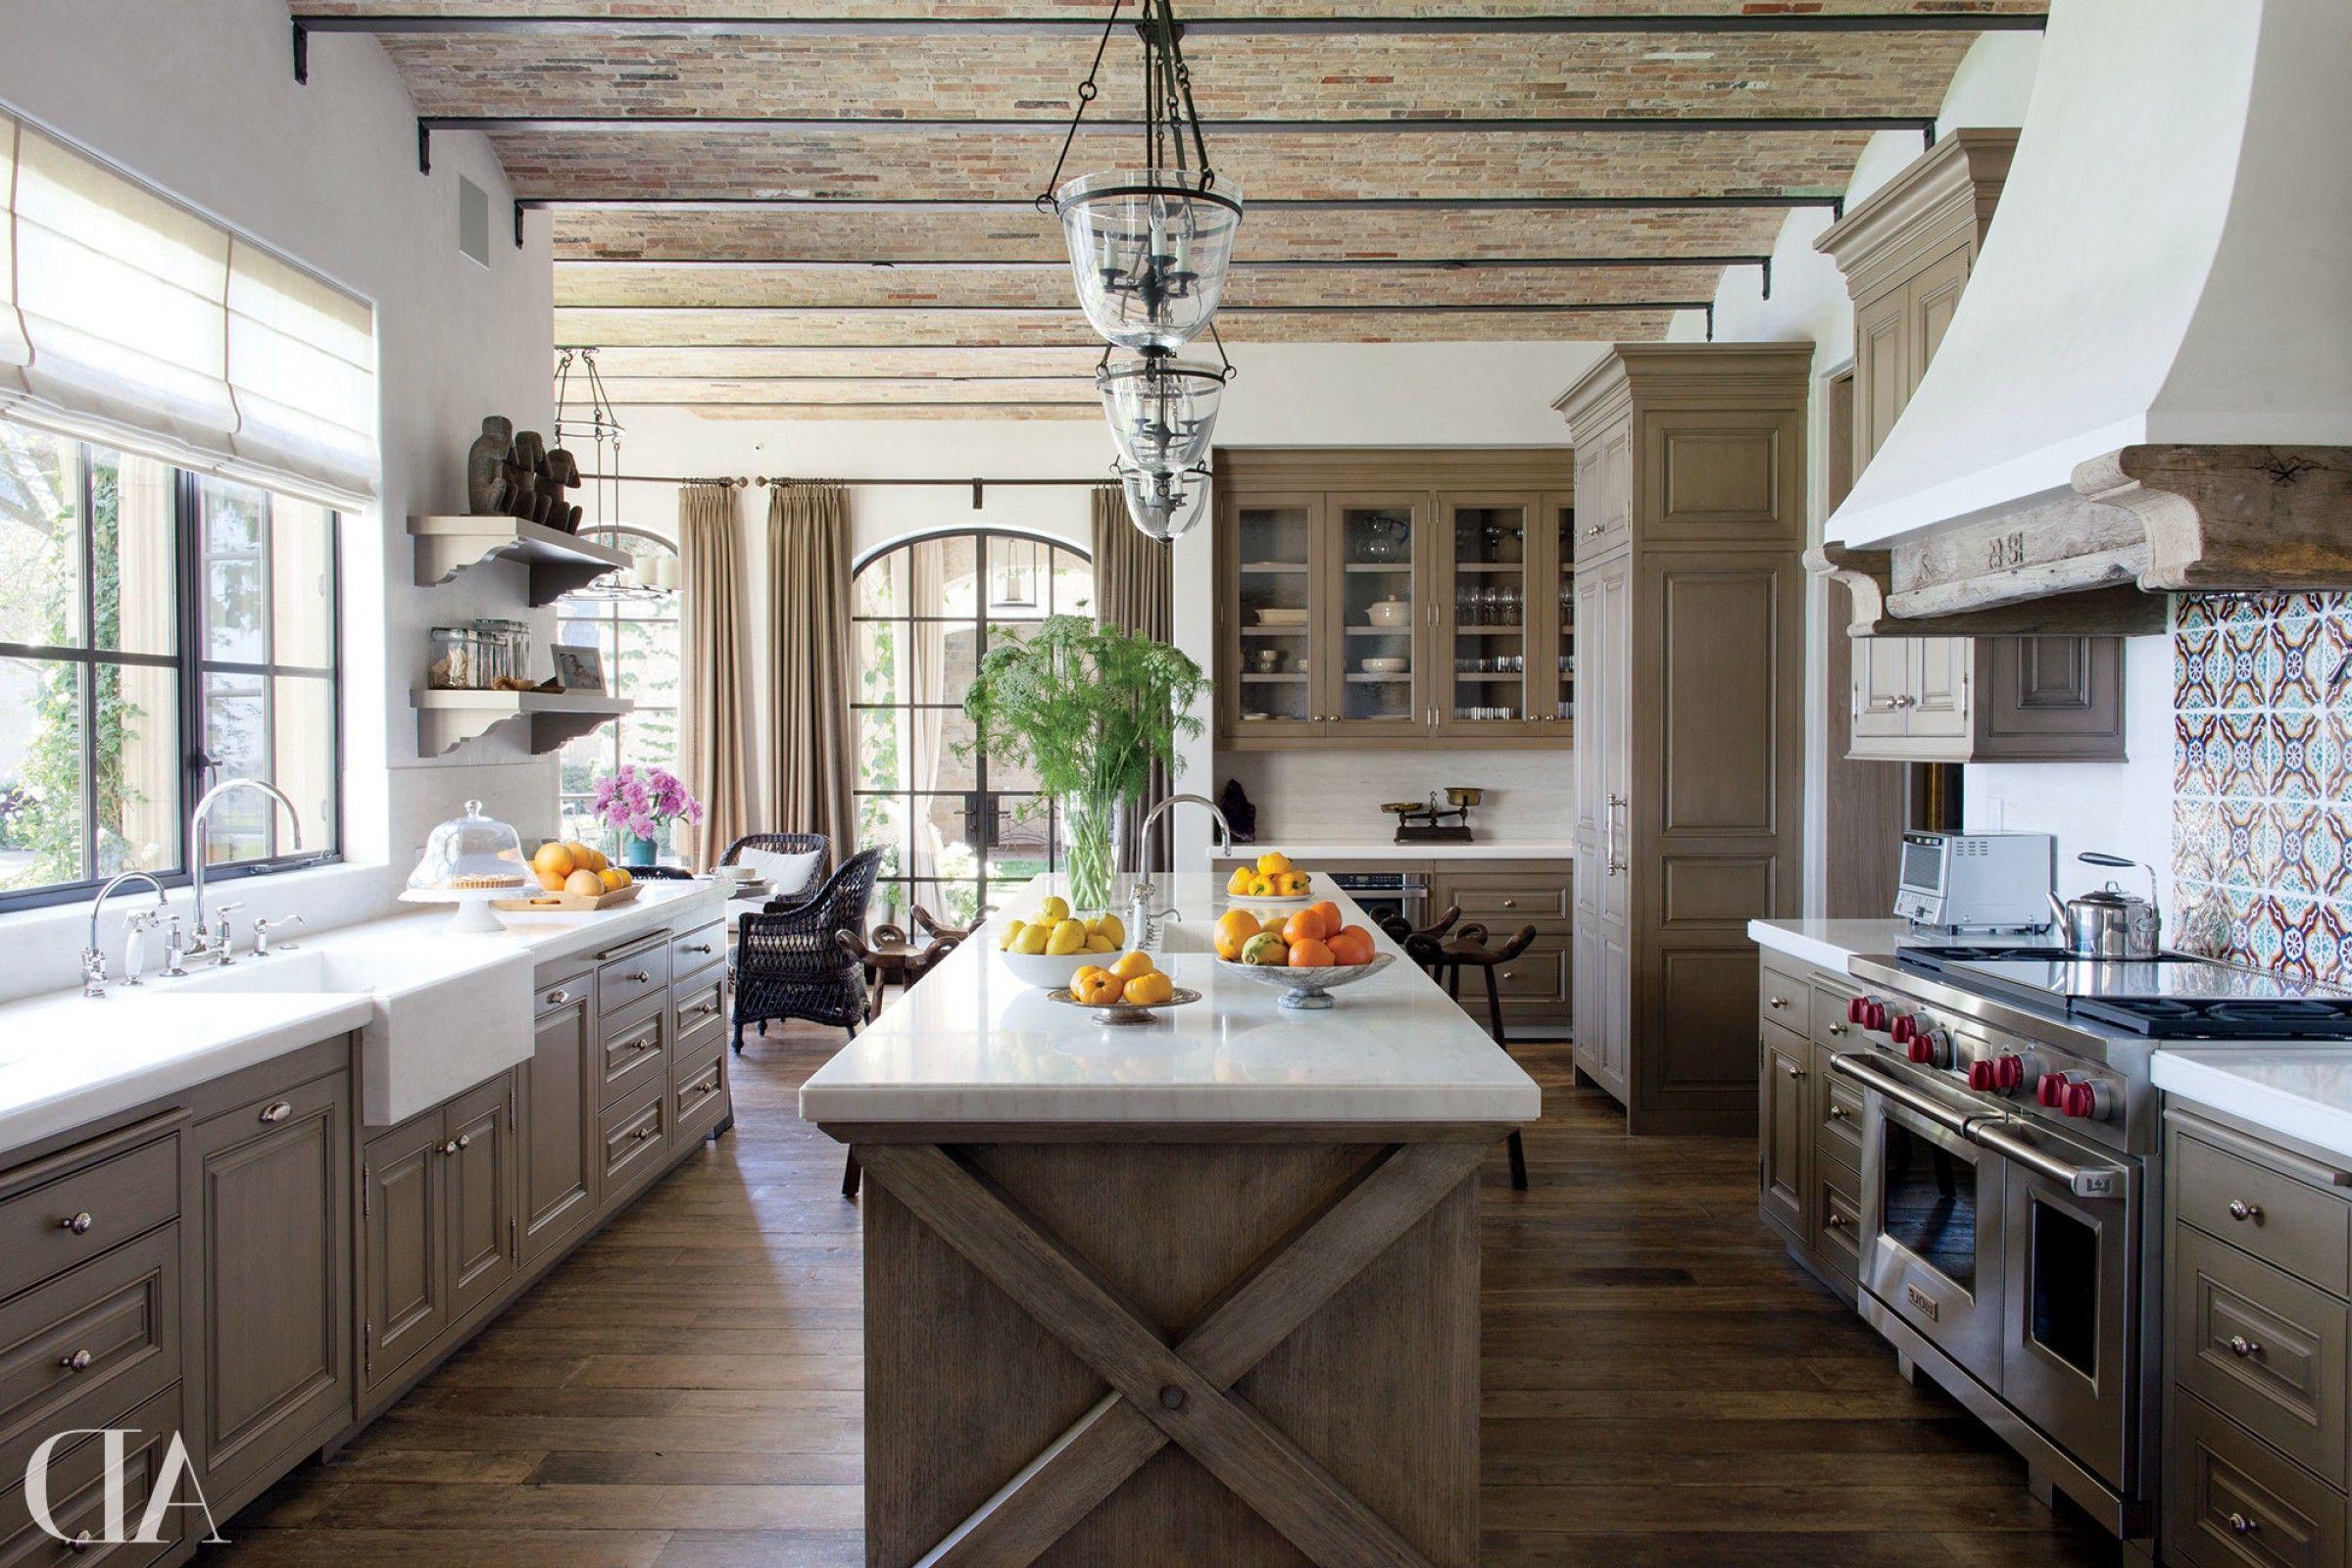 rustic modern farmhouse kitchens elegant farmhouse kitchens ideas french farmhouse kitchen on kitchen cabinets rustic farmhouse style id=91160